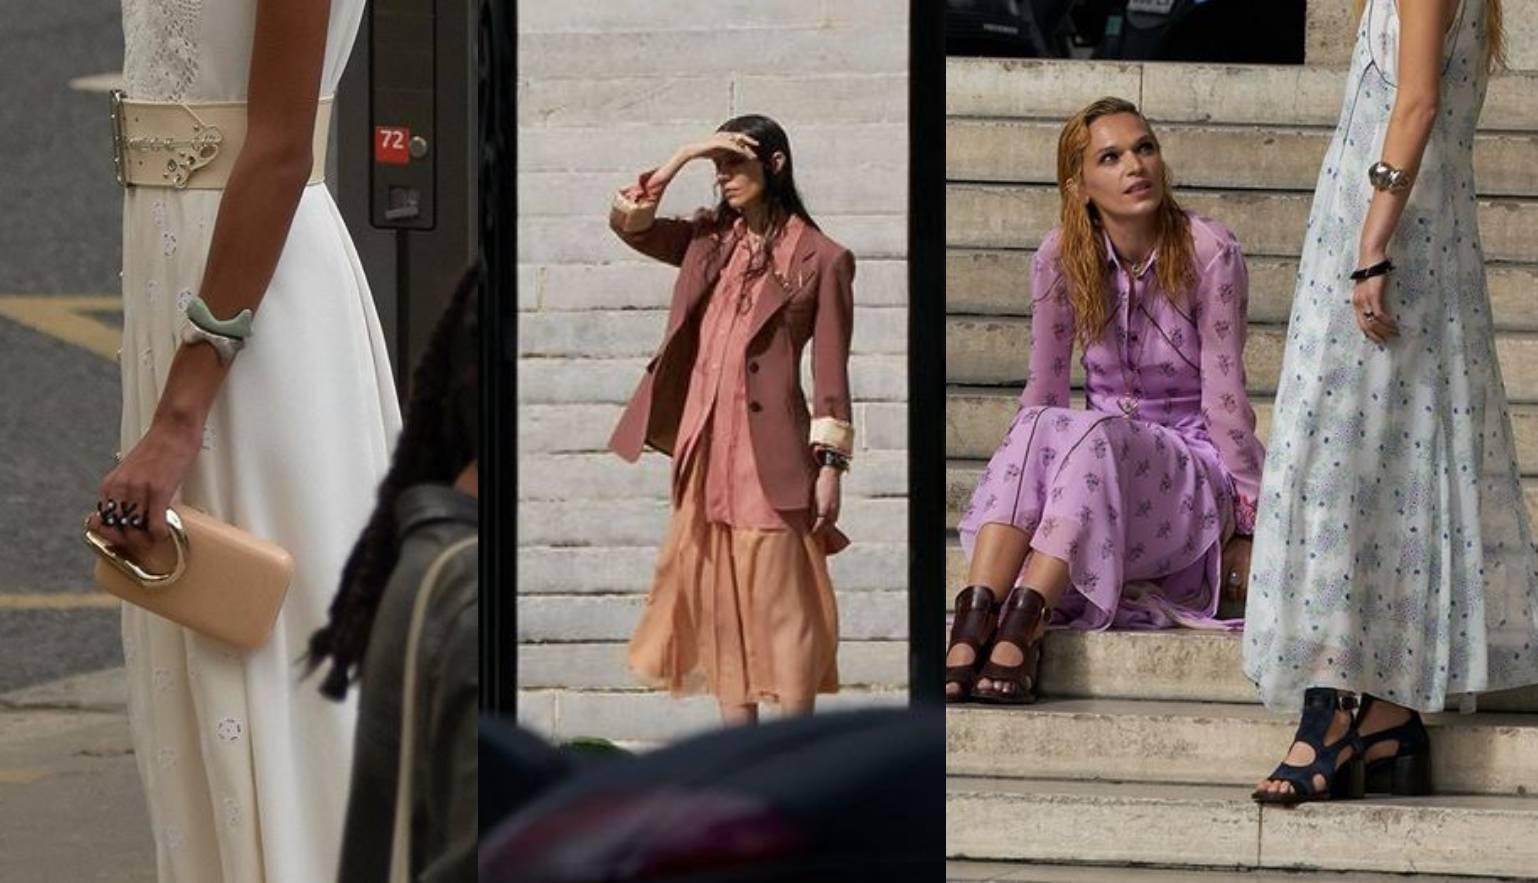 Nova romantika: Chloé stil je simbioza slojevitosti i udobnosti